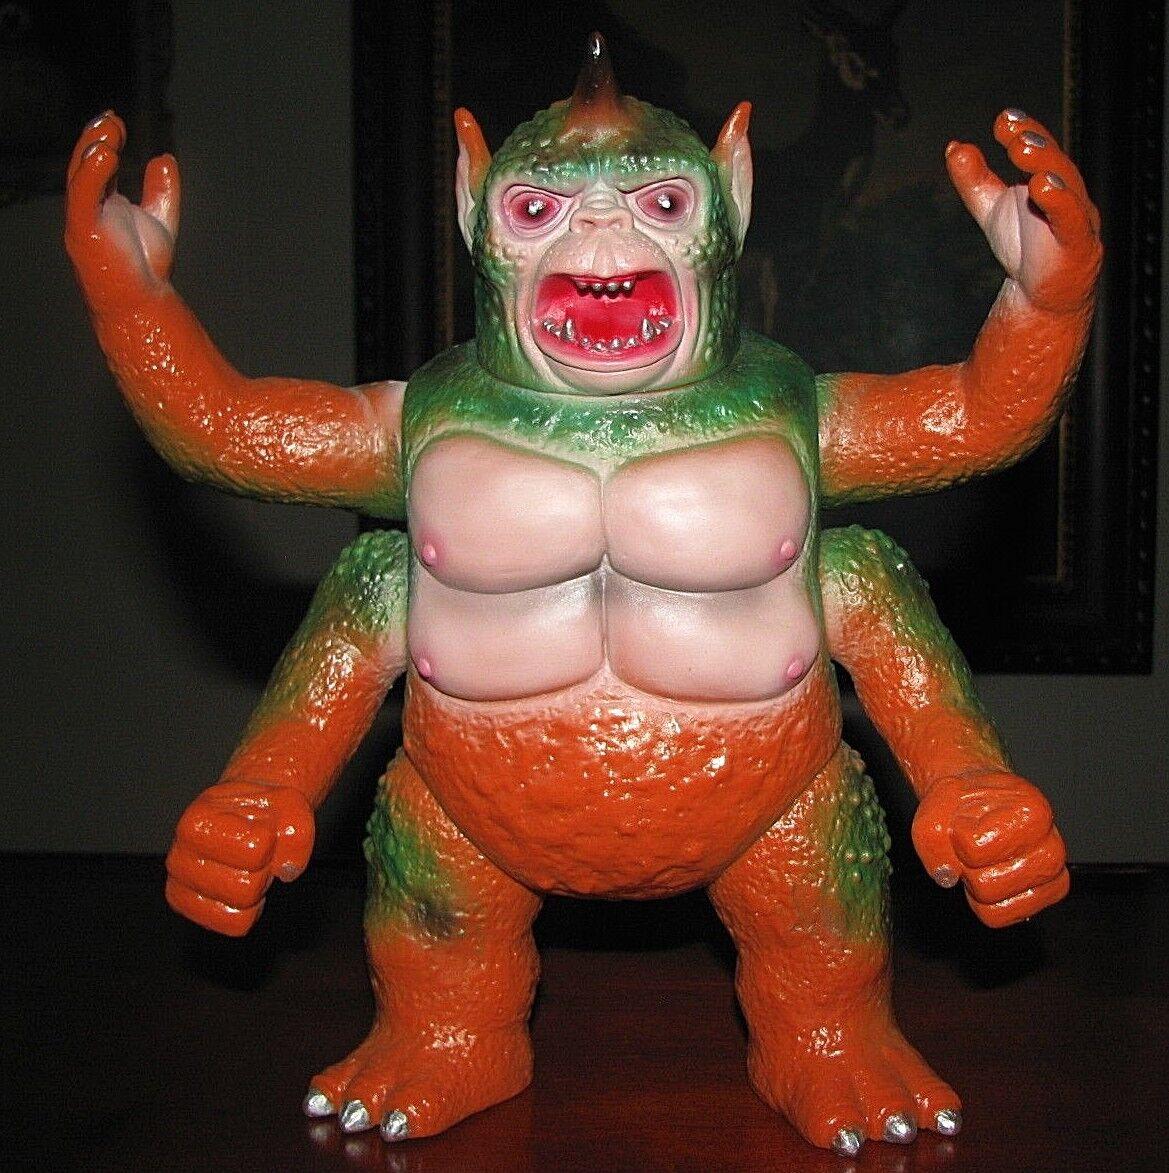 Krono-Secretoy (Splurrt, Bemon , Kaiju Hellbraun, Nagnagnag, Marmit, Kraken)